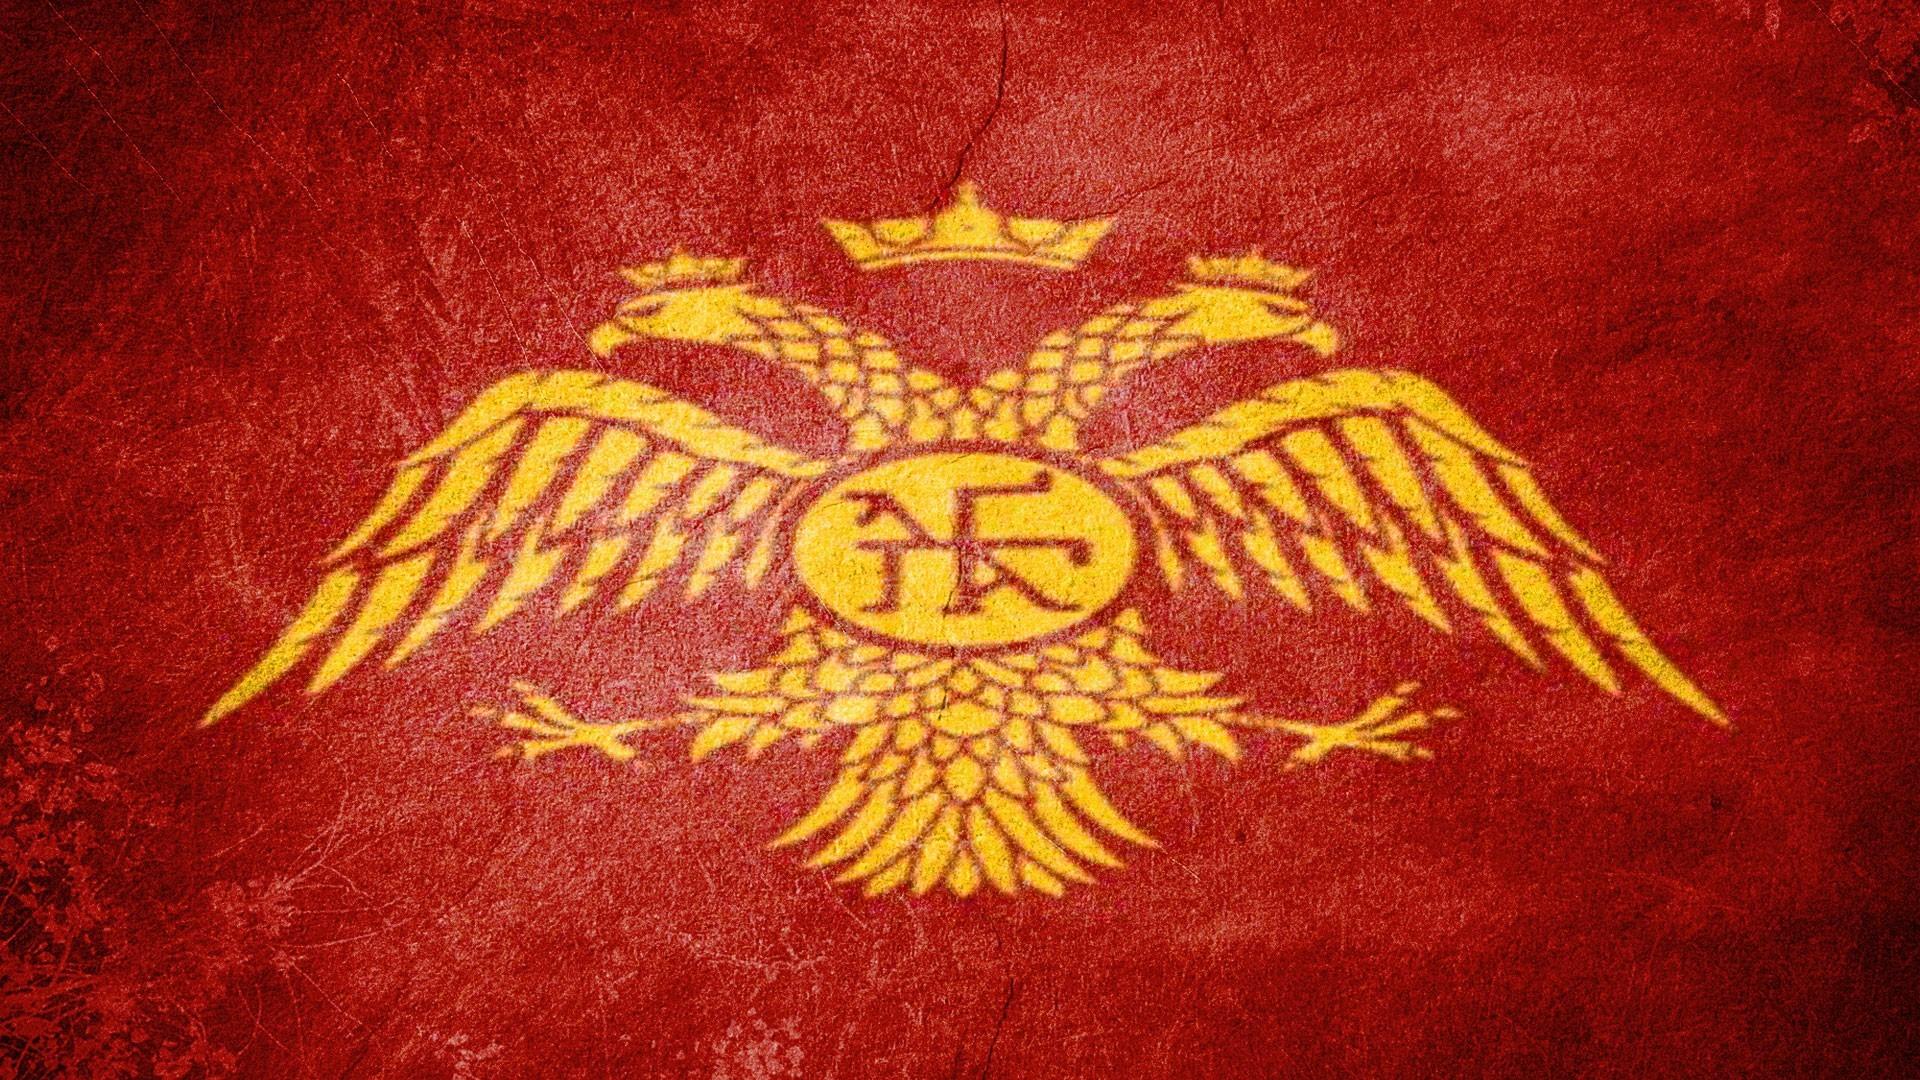 Roman Legion Wallpaper Tv show rome wallpaper Historywars and 1920×1080